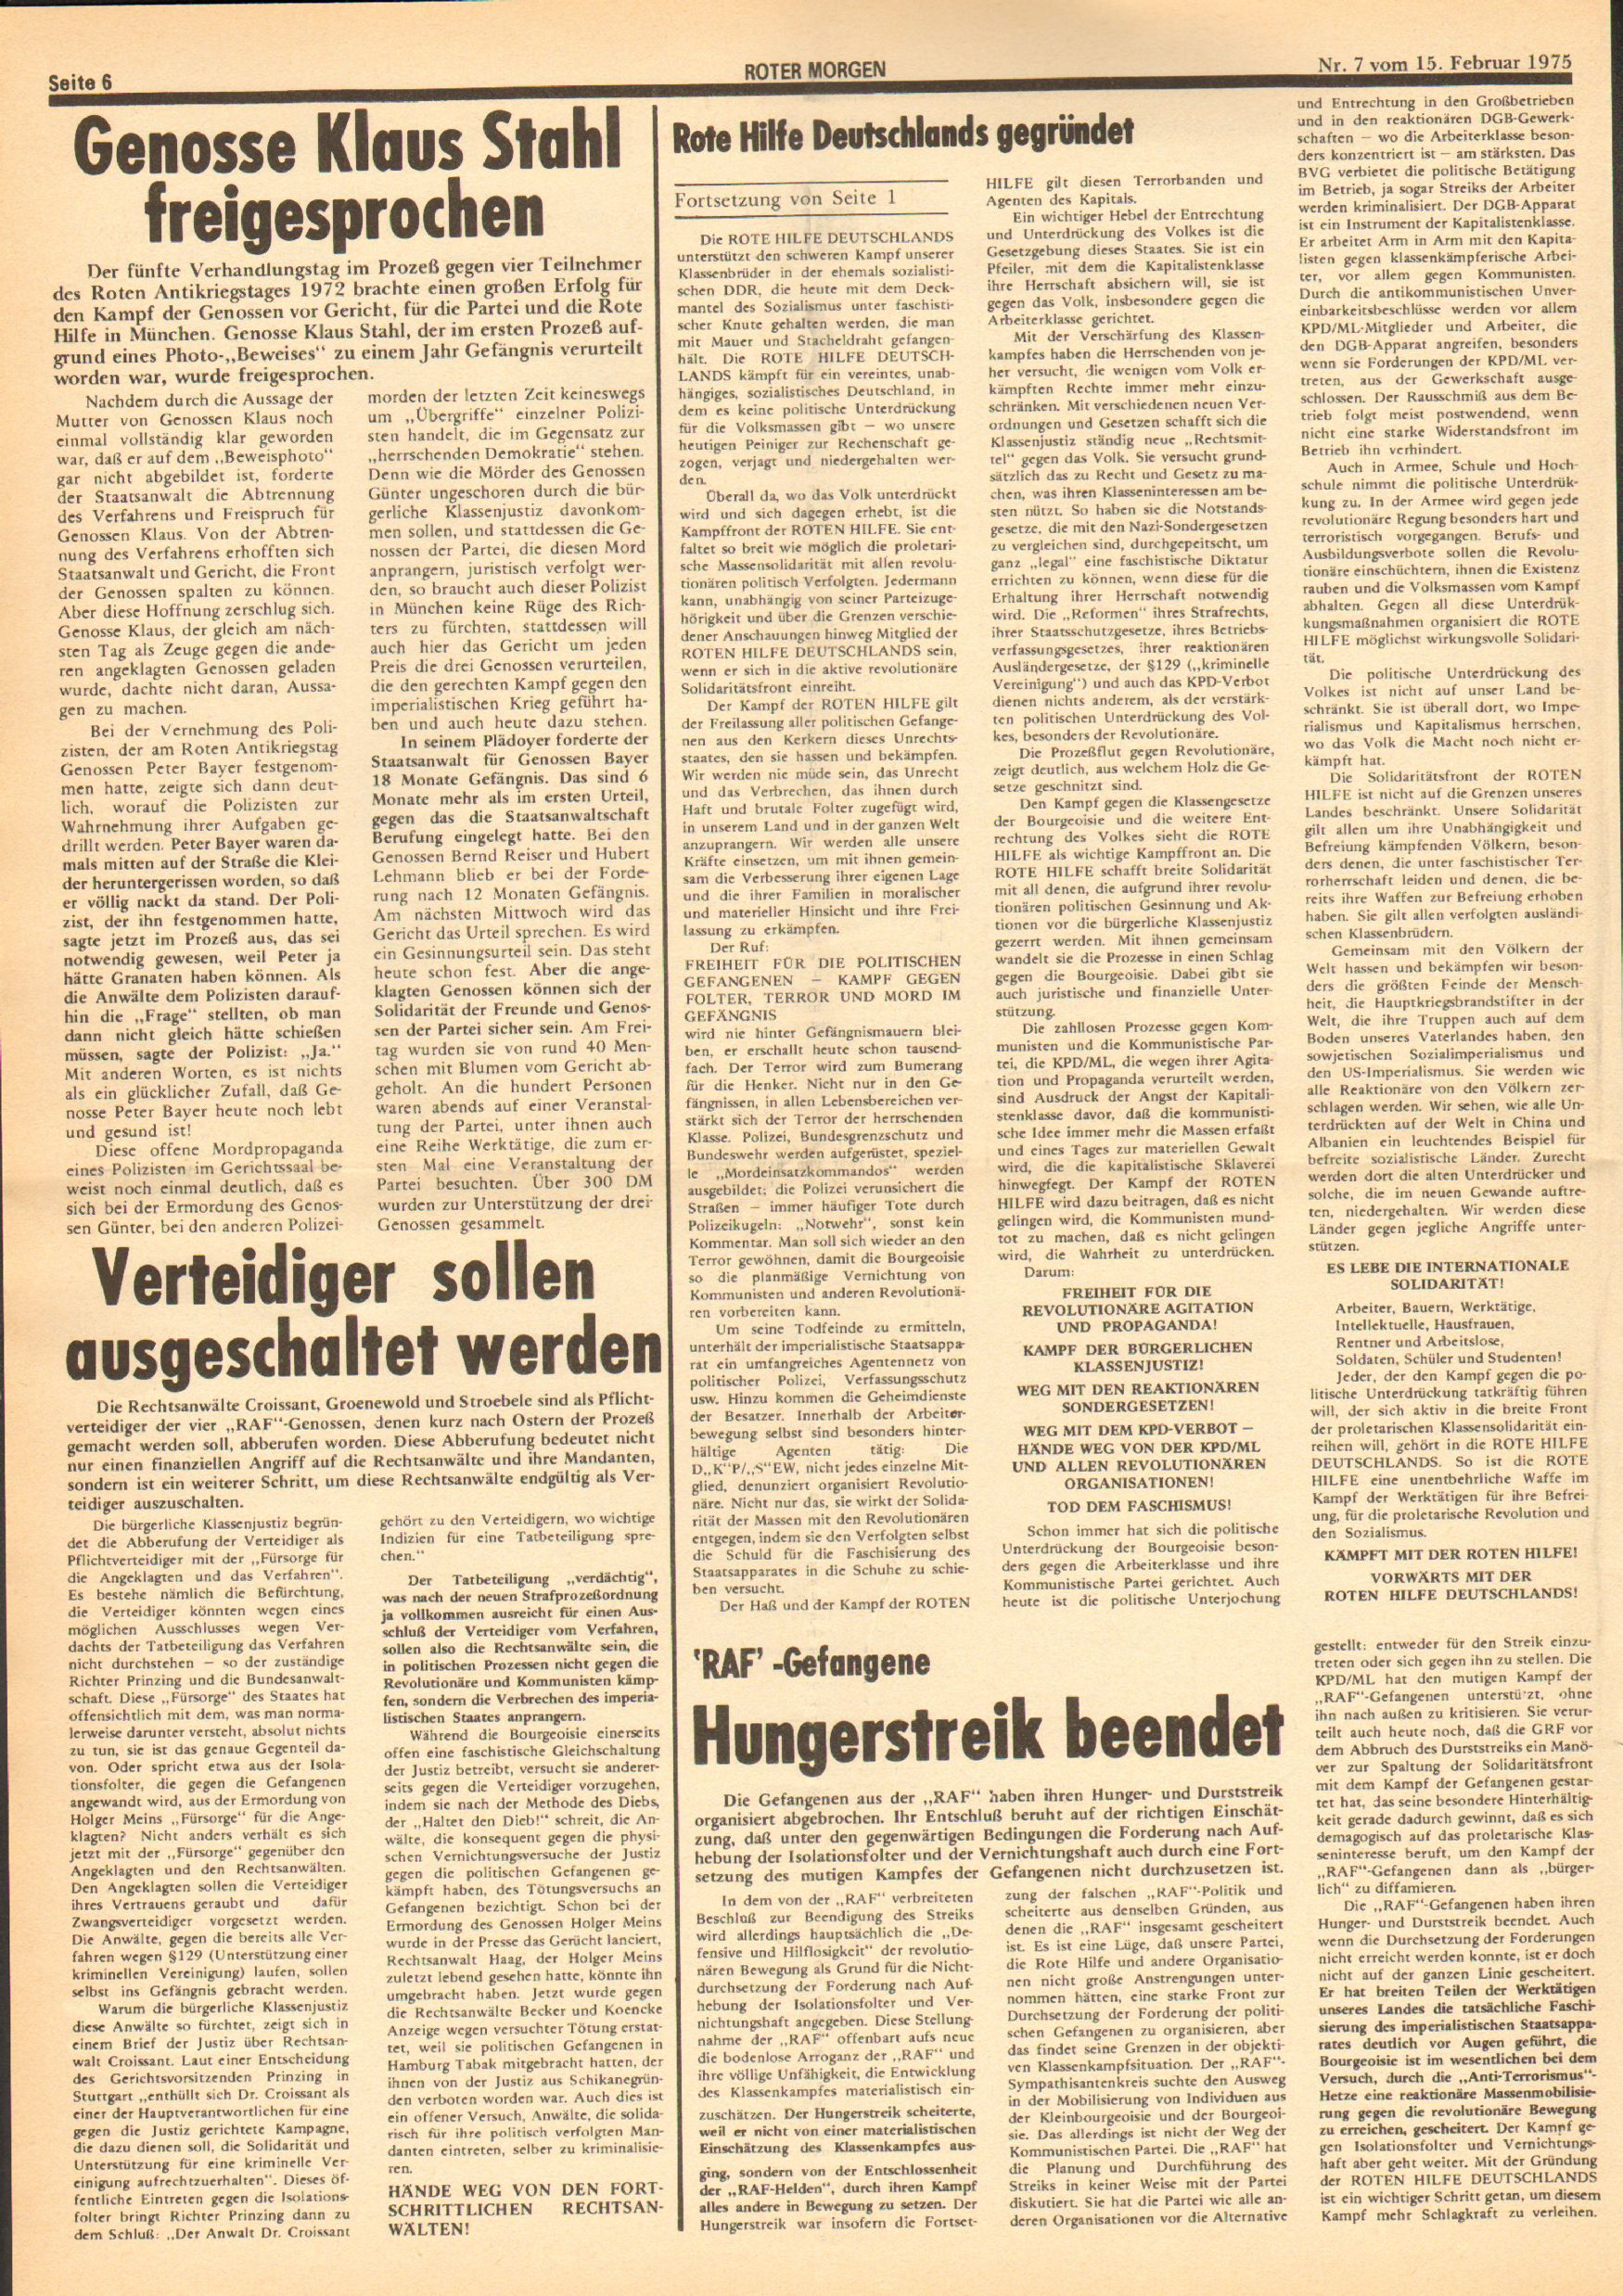 Roter Morgen, 9. Jg., 15. Februar 1975, Nr. 7, Seite 6